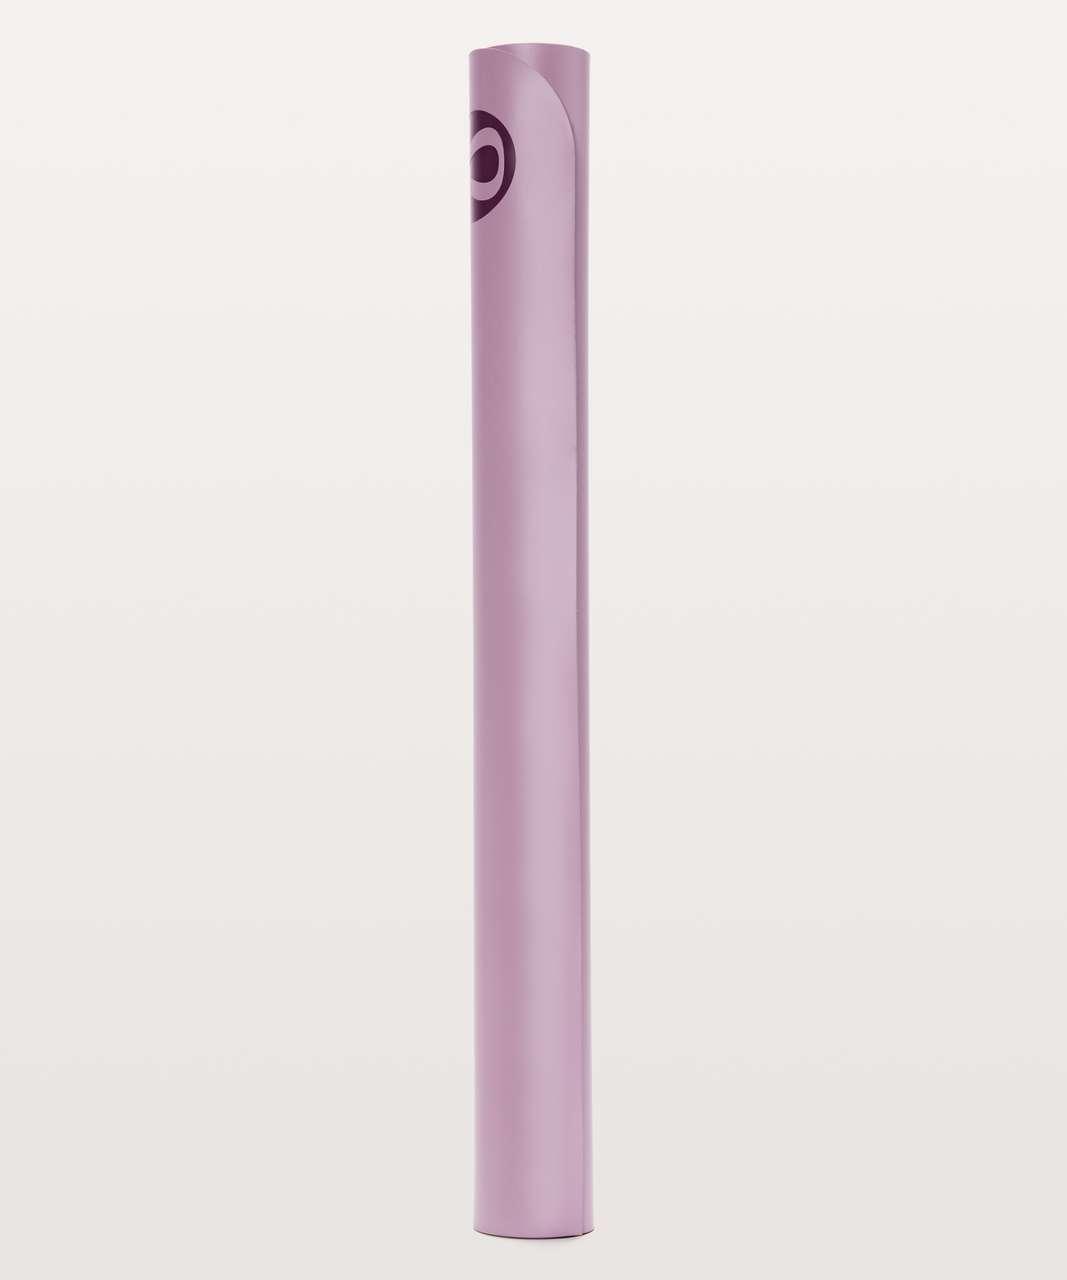 Lululemon The Reversible (Un) Mat *Lightweight Travel - Violetta / Smoked Mulberry